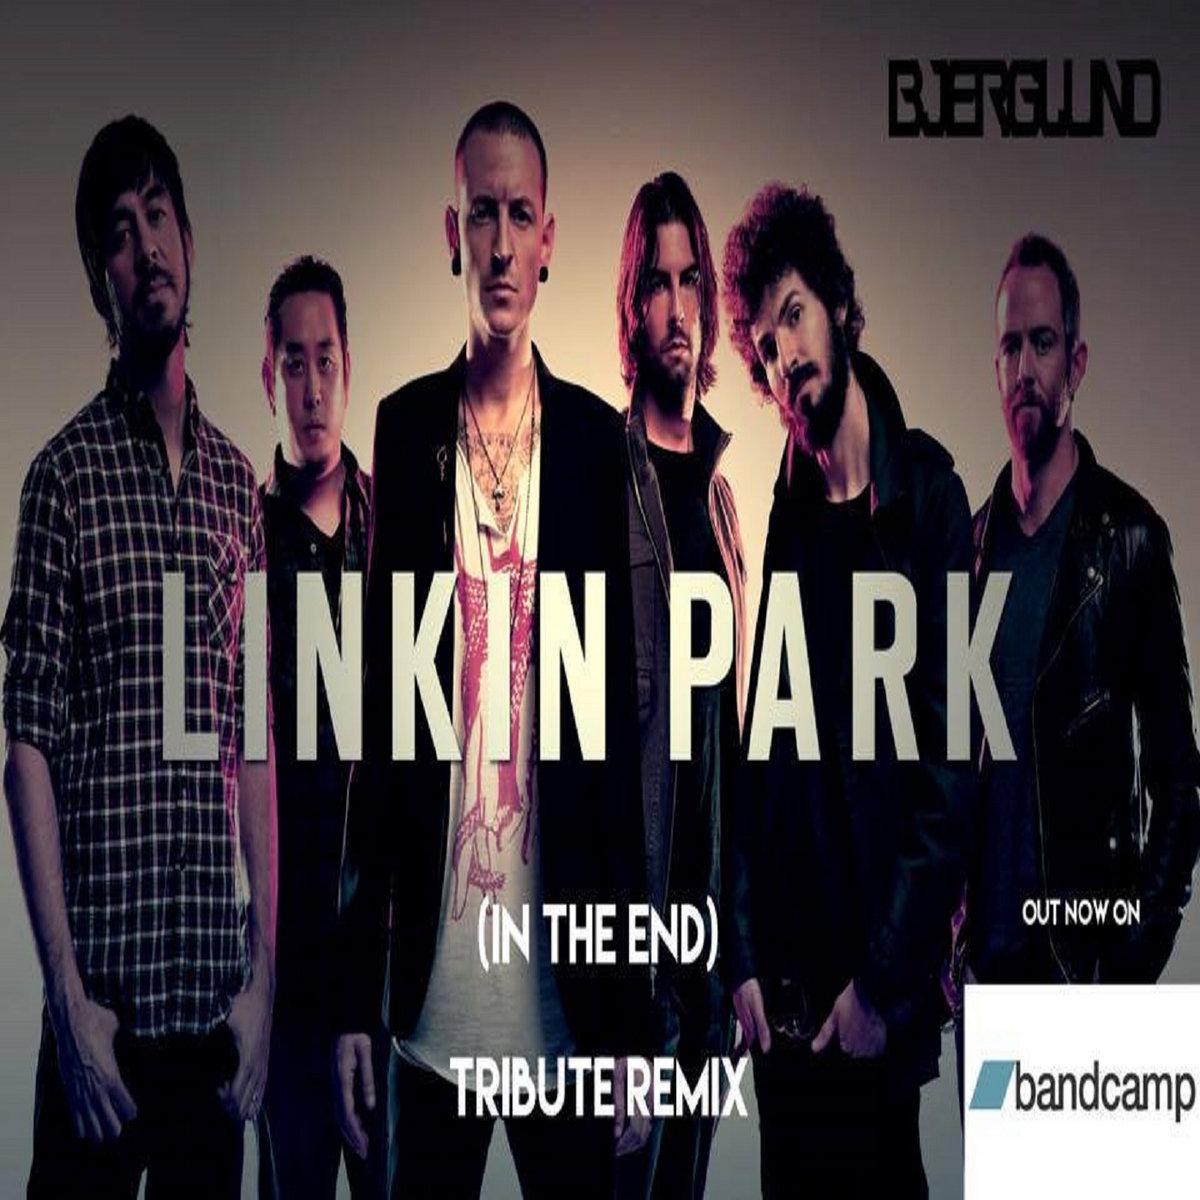 Linkin Park (In The End) Bjerglund Tribute Remix | Bjerglund